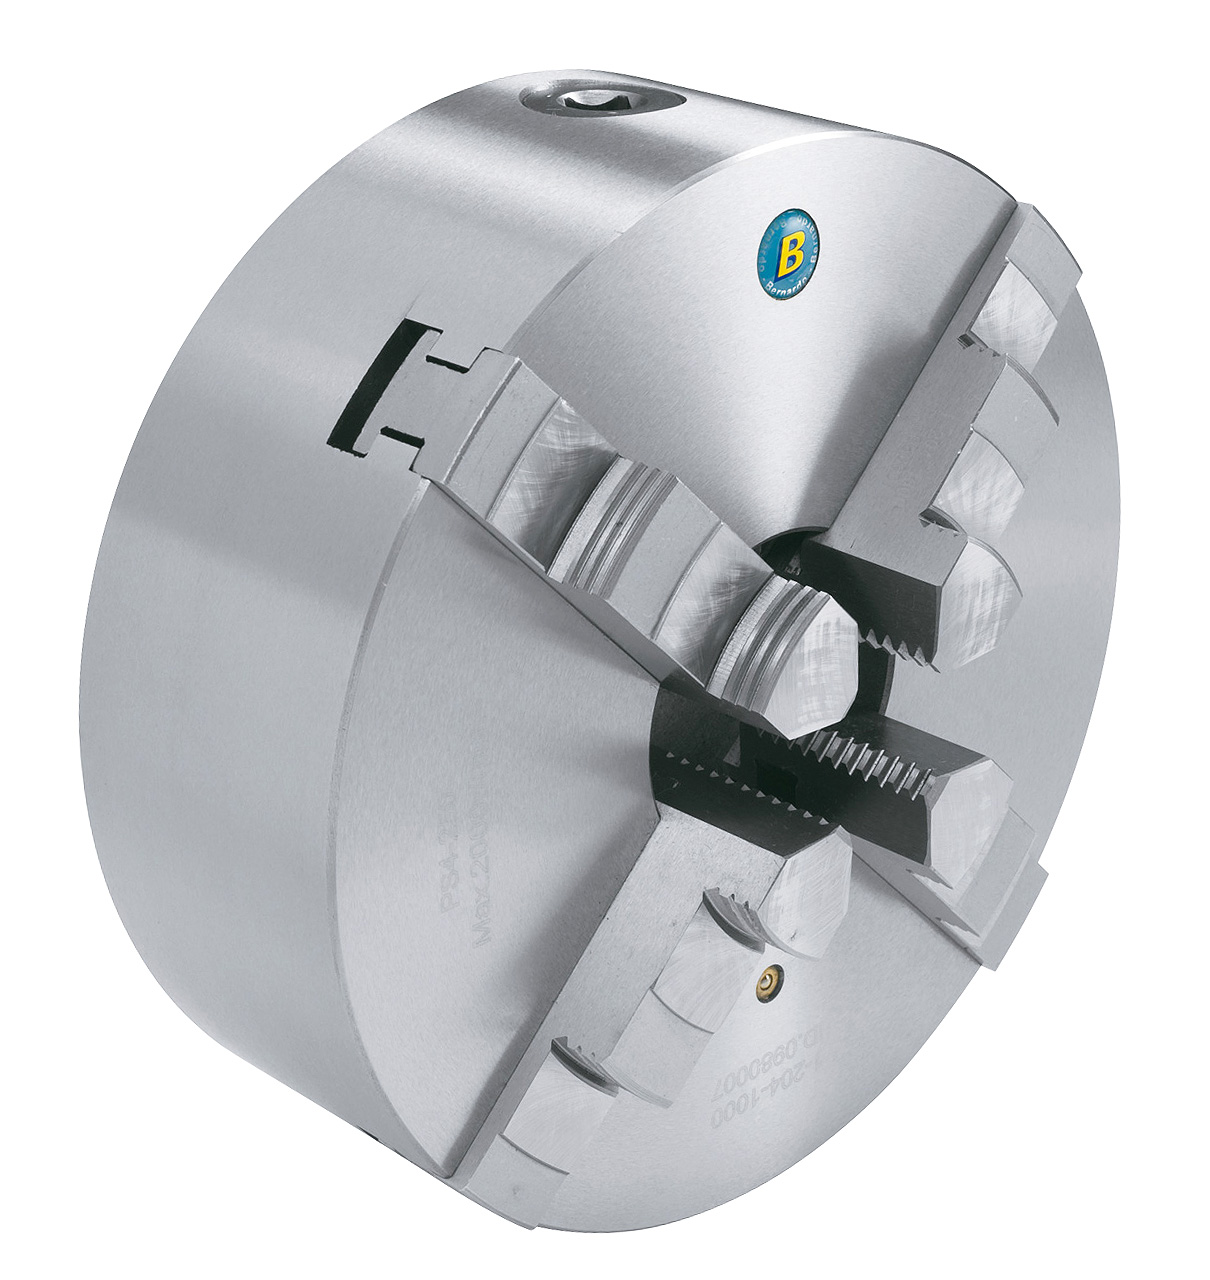 Standard-4-bakket centrerpatron DK12-125